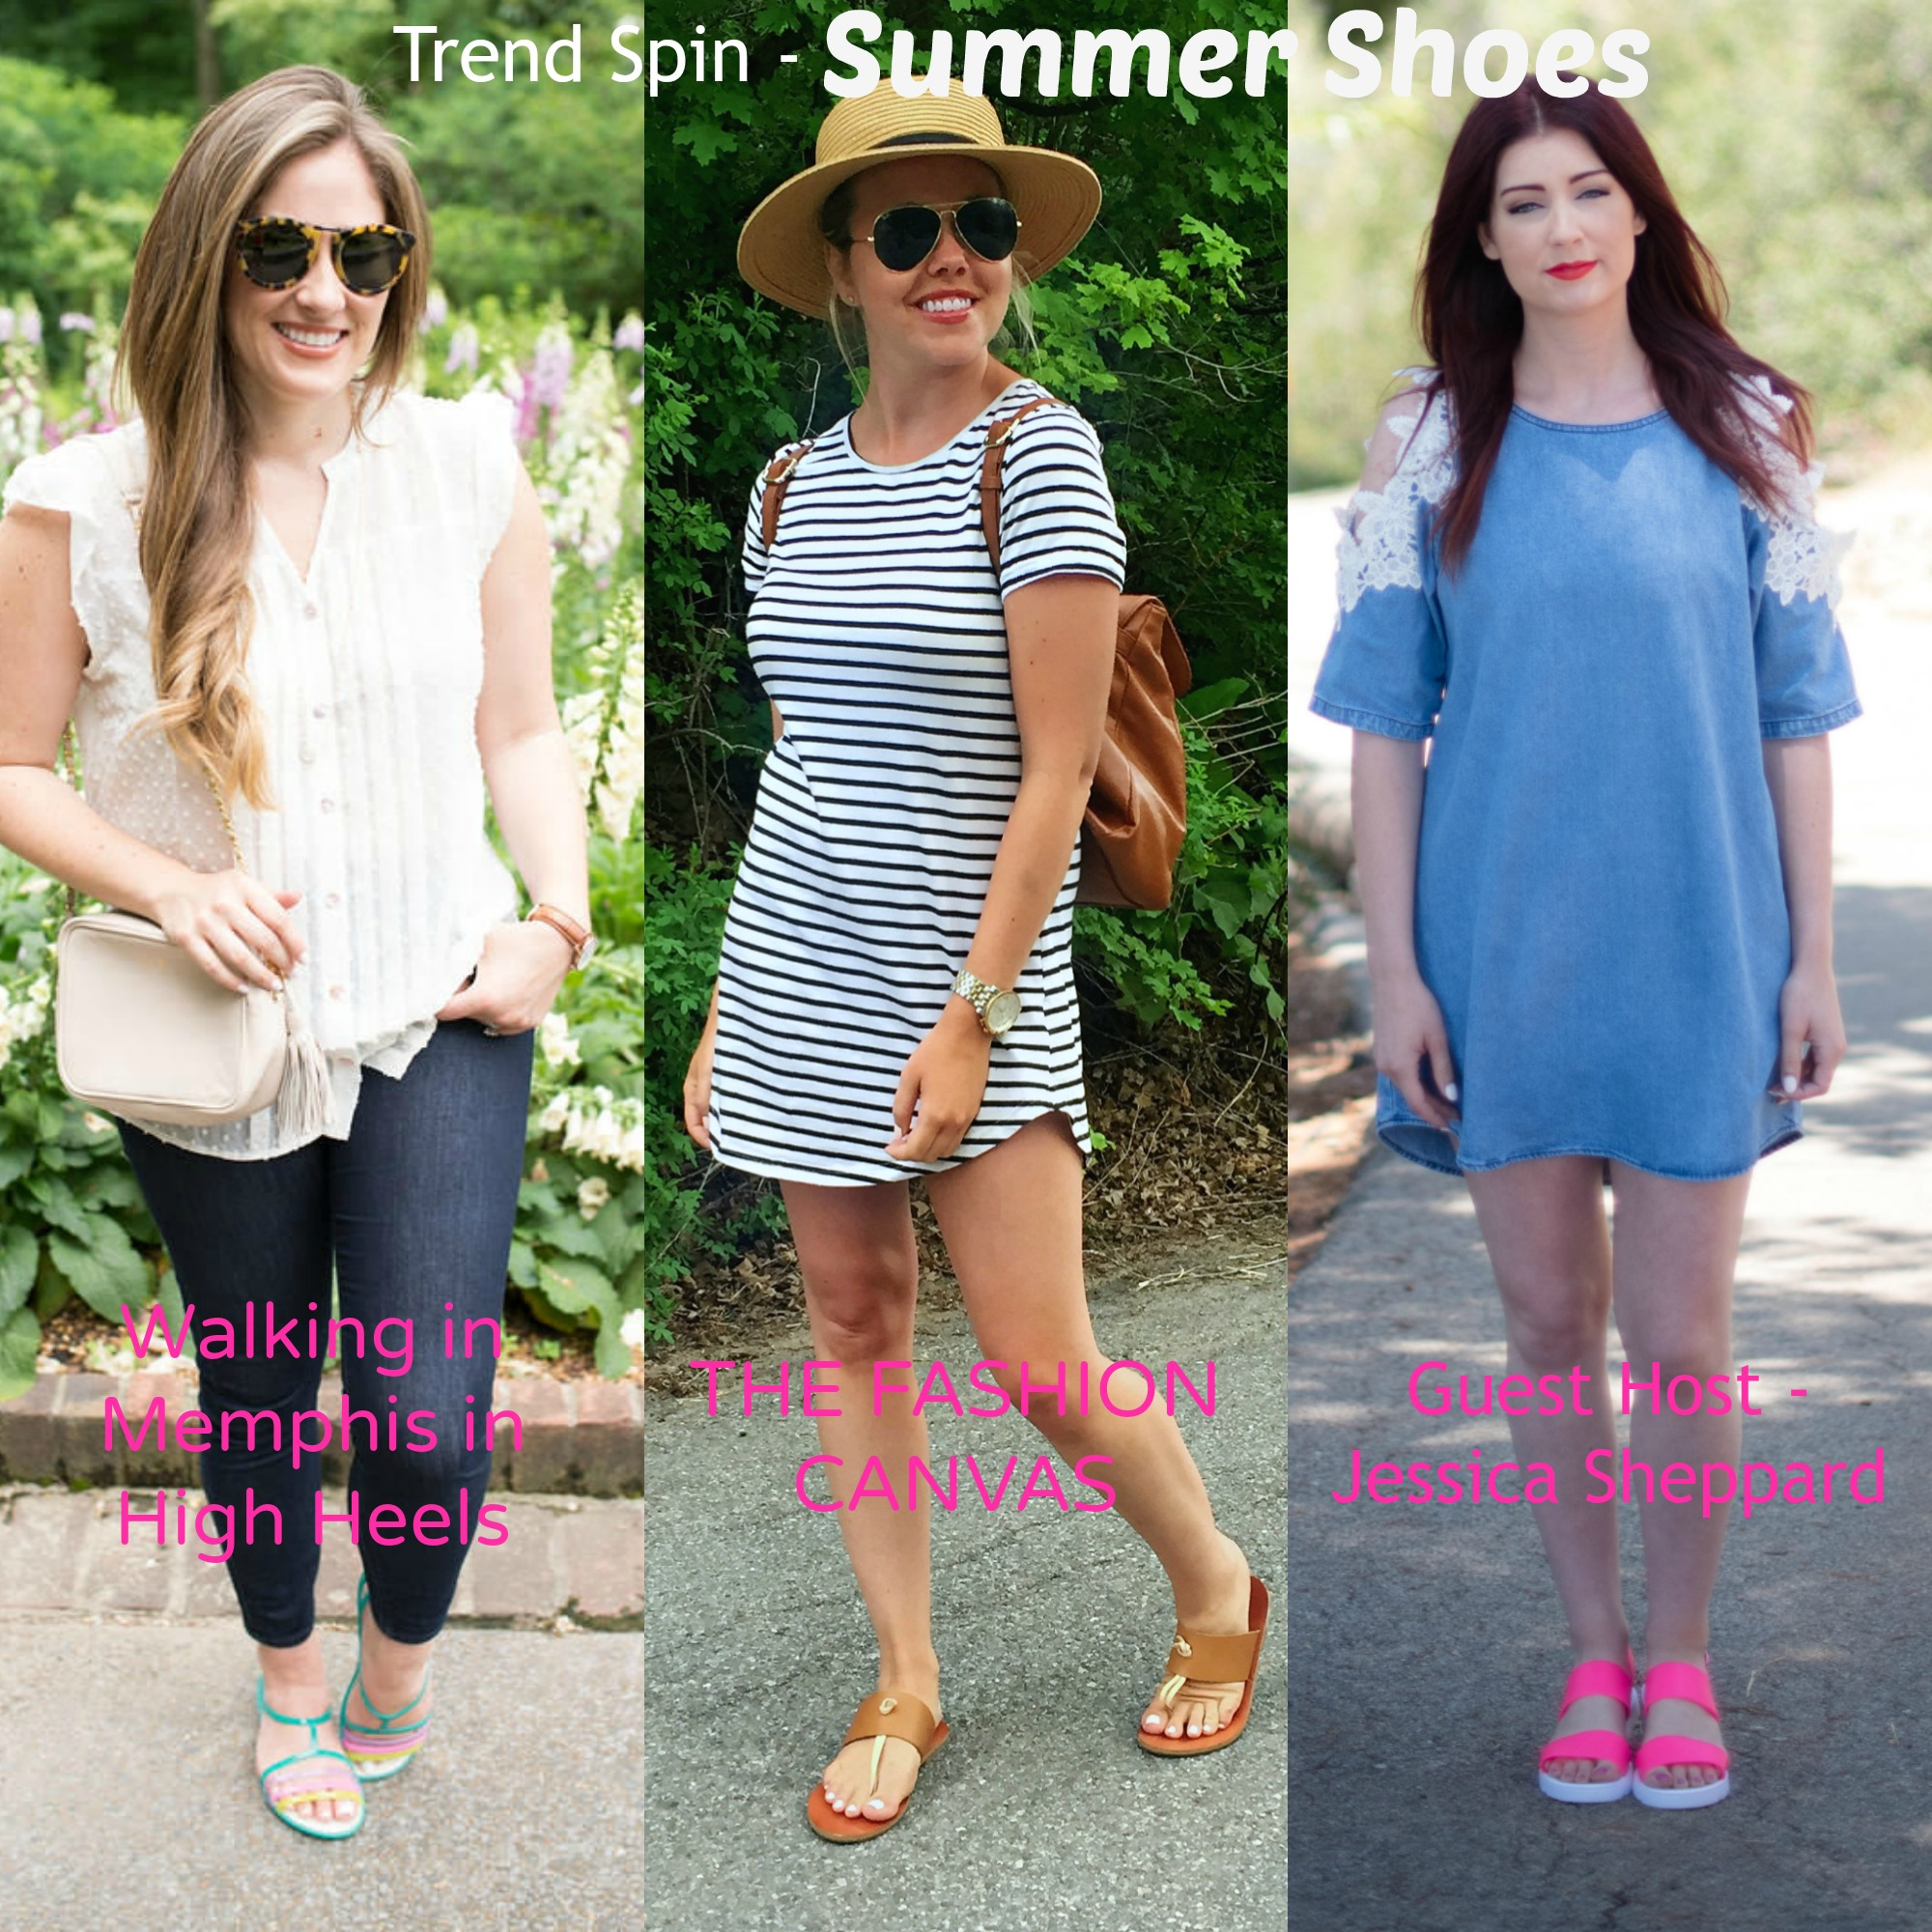 Trend-Spin-Header-Summer-Shoes.jpg